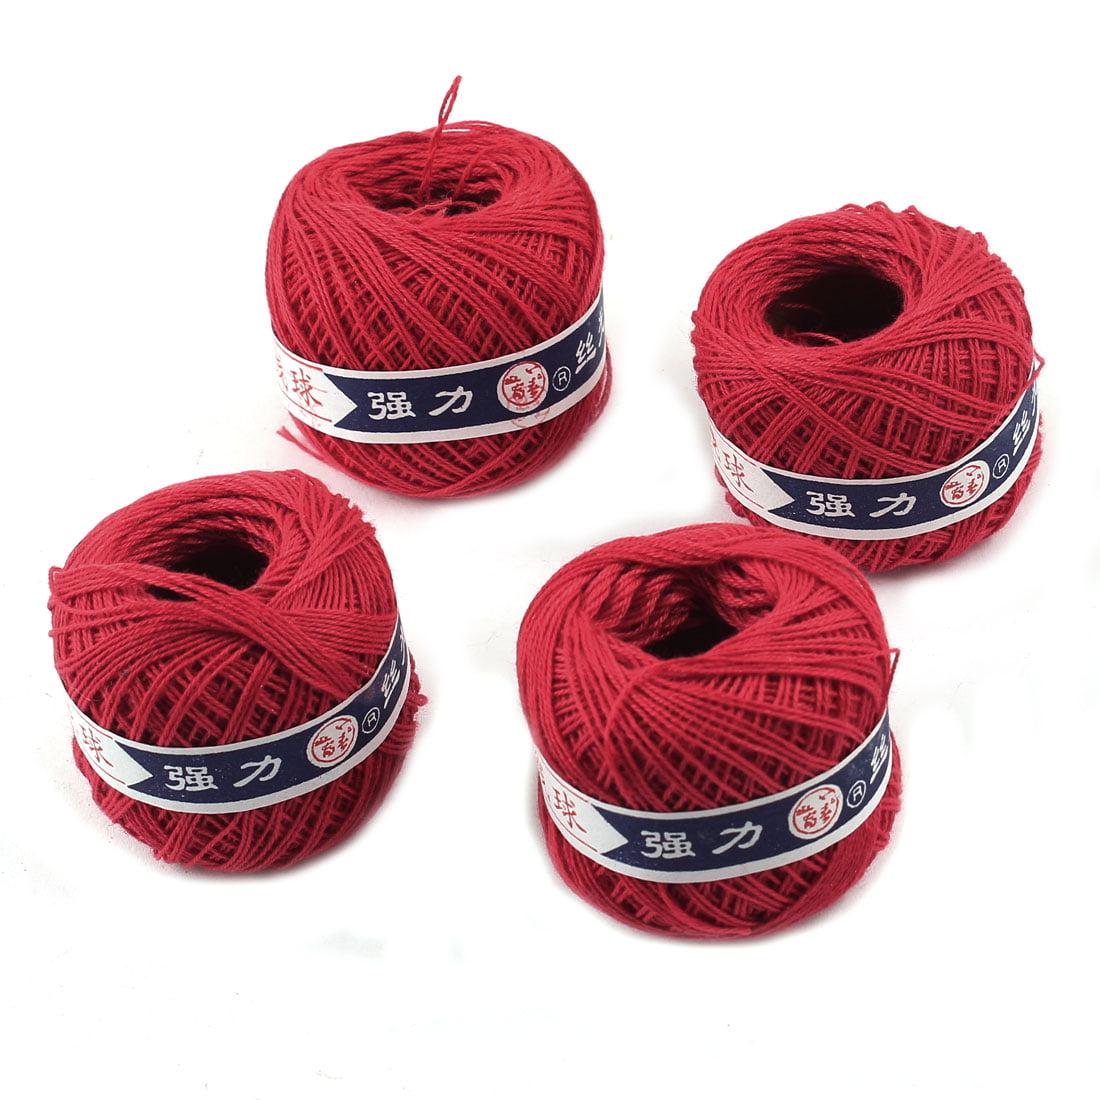 4 Pcs Red Spools Thread Sewing Balls Skeins Crochet String